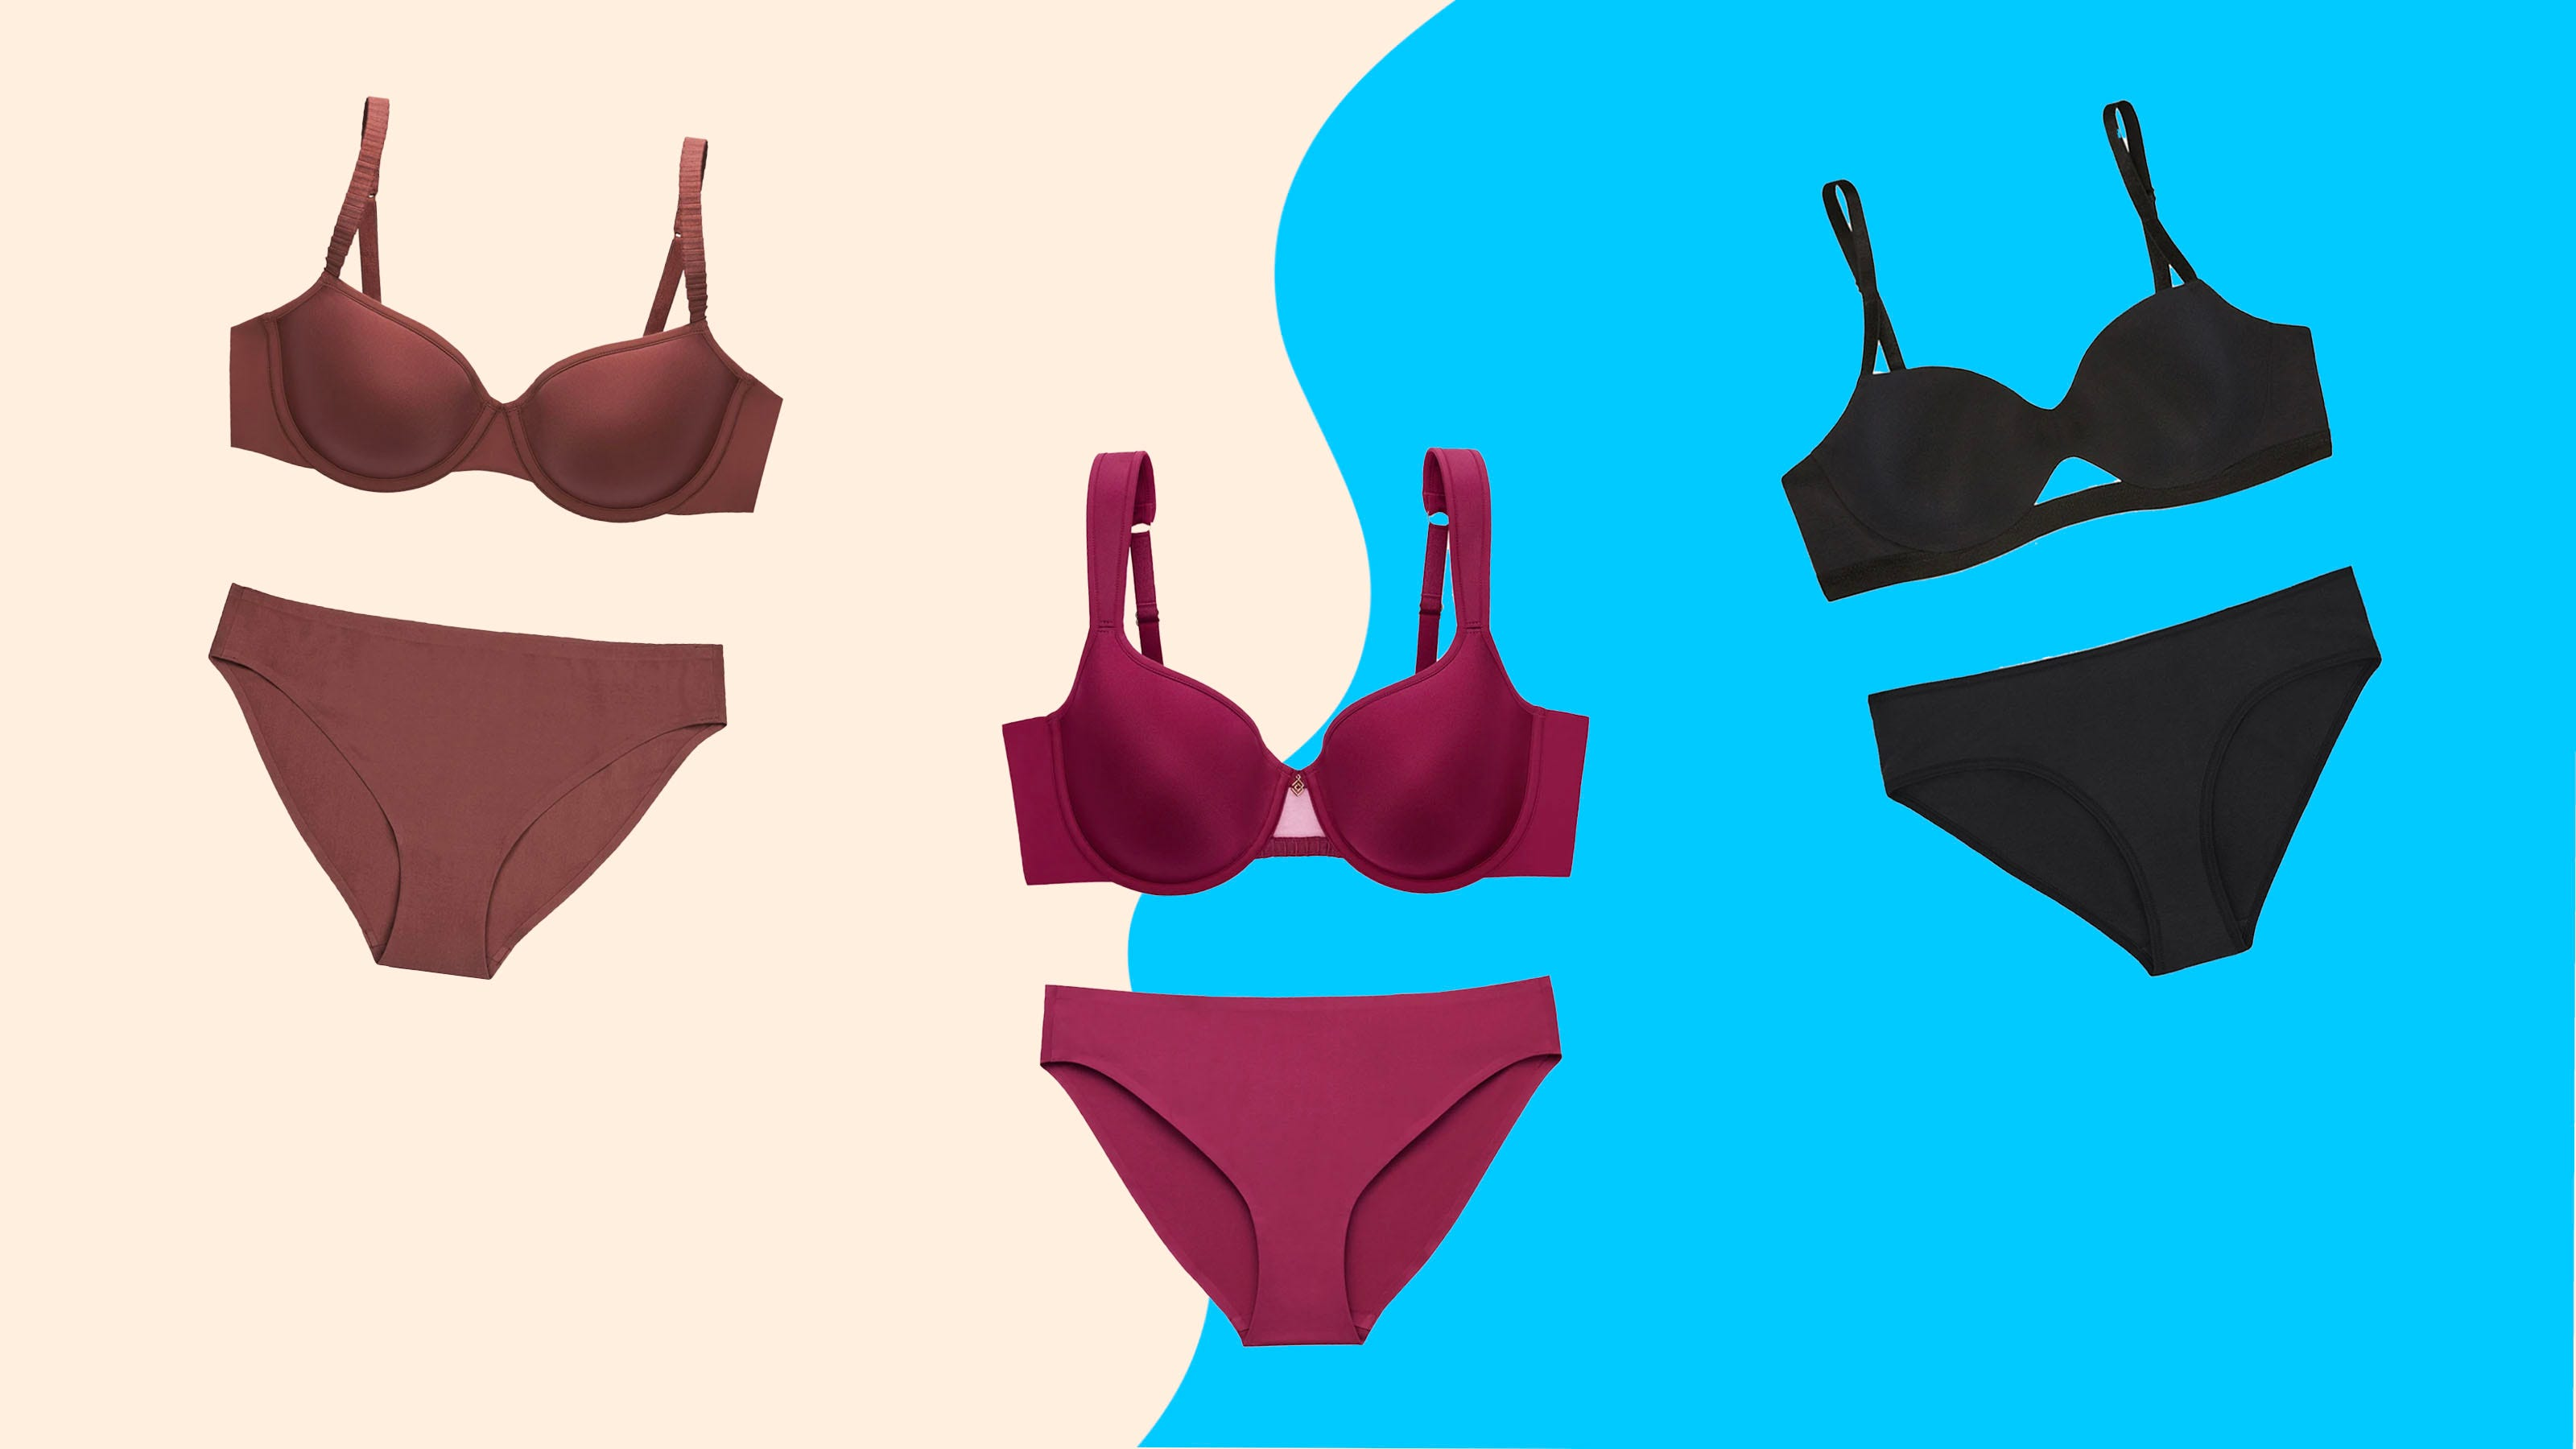 Save big on ThirdLove's Internet-famous bra and underwear sets